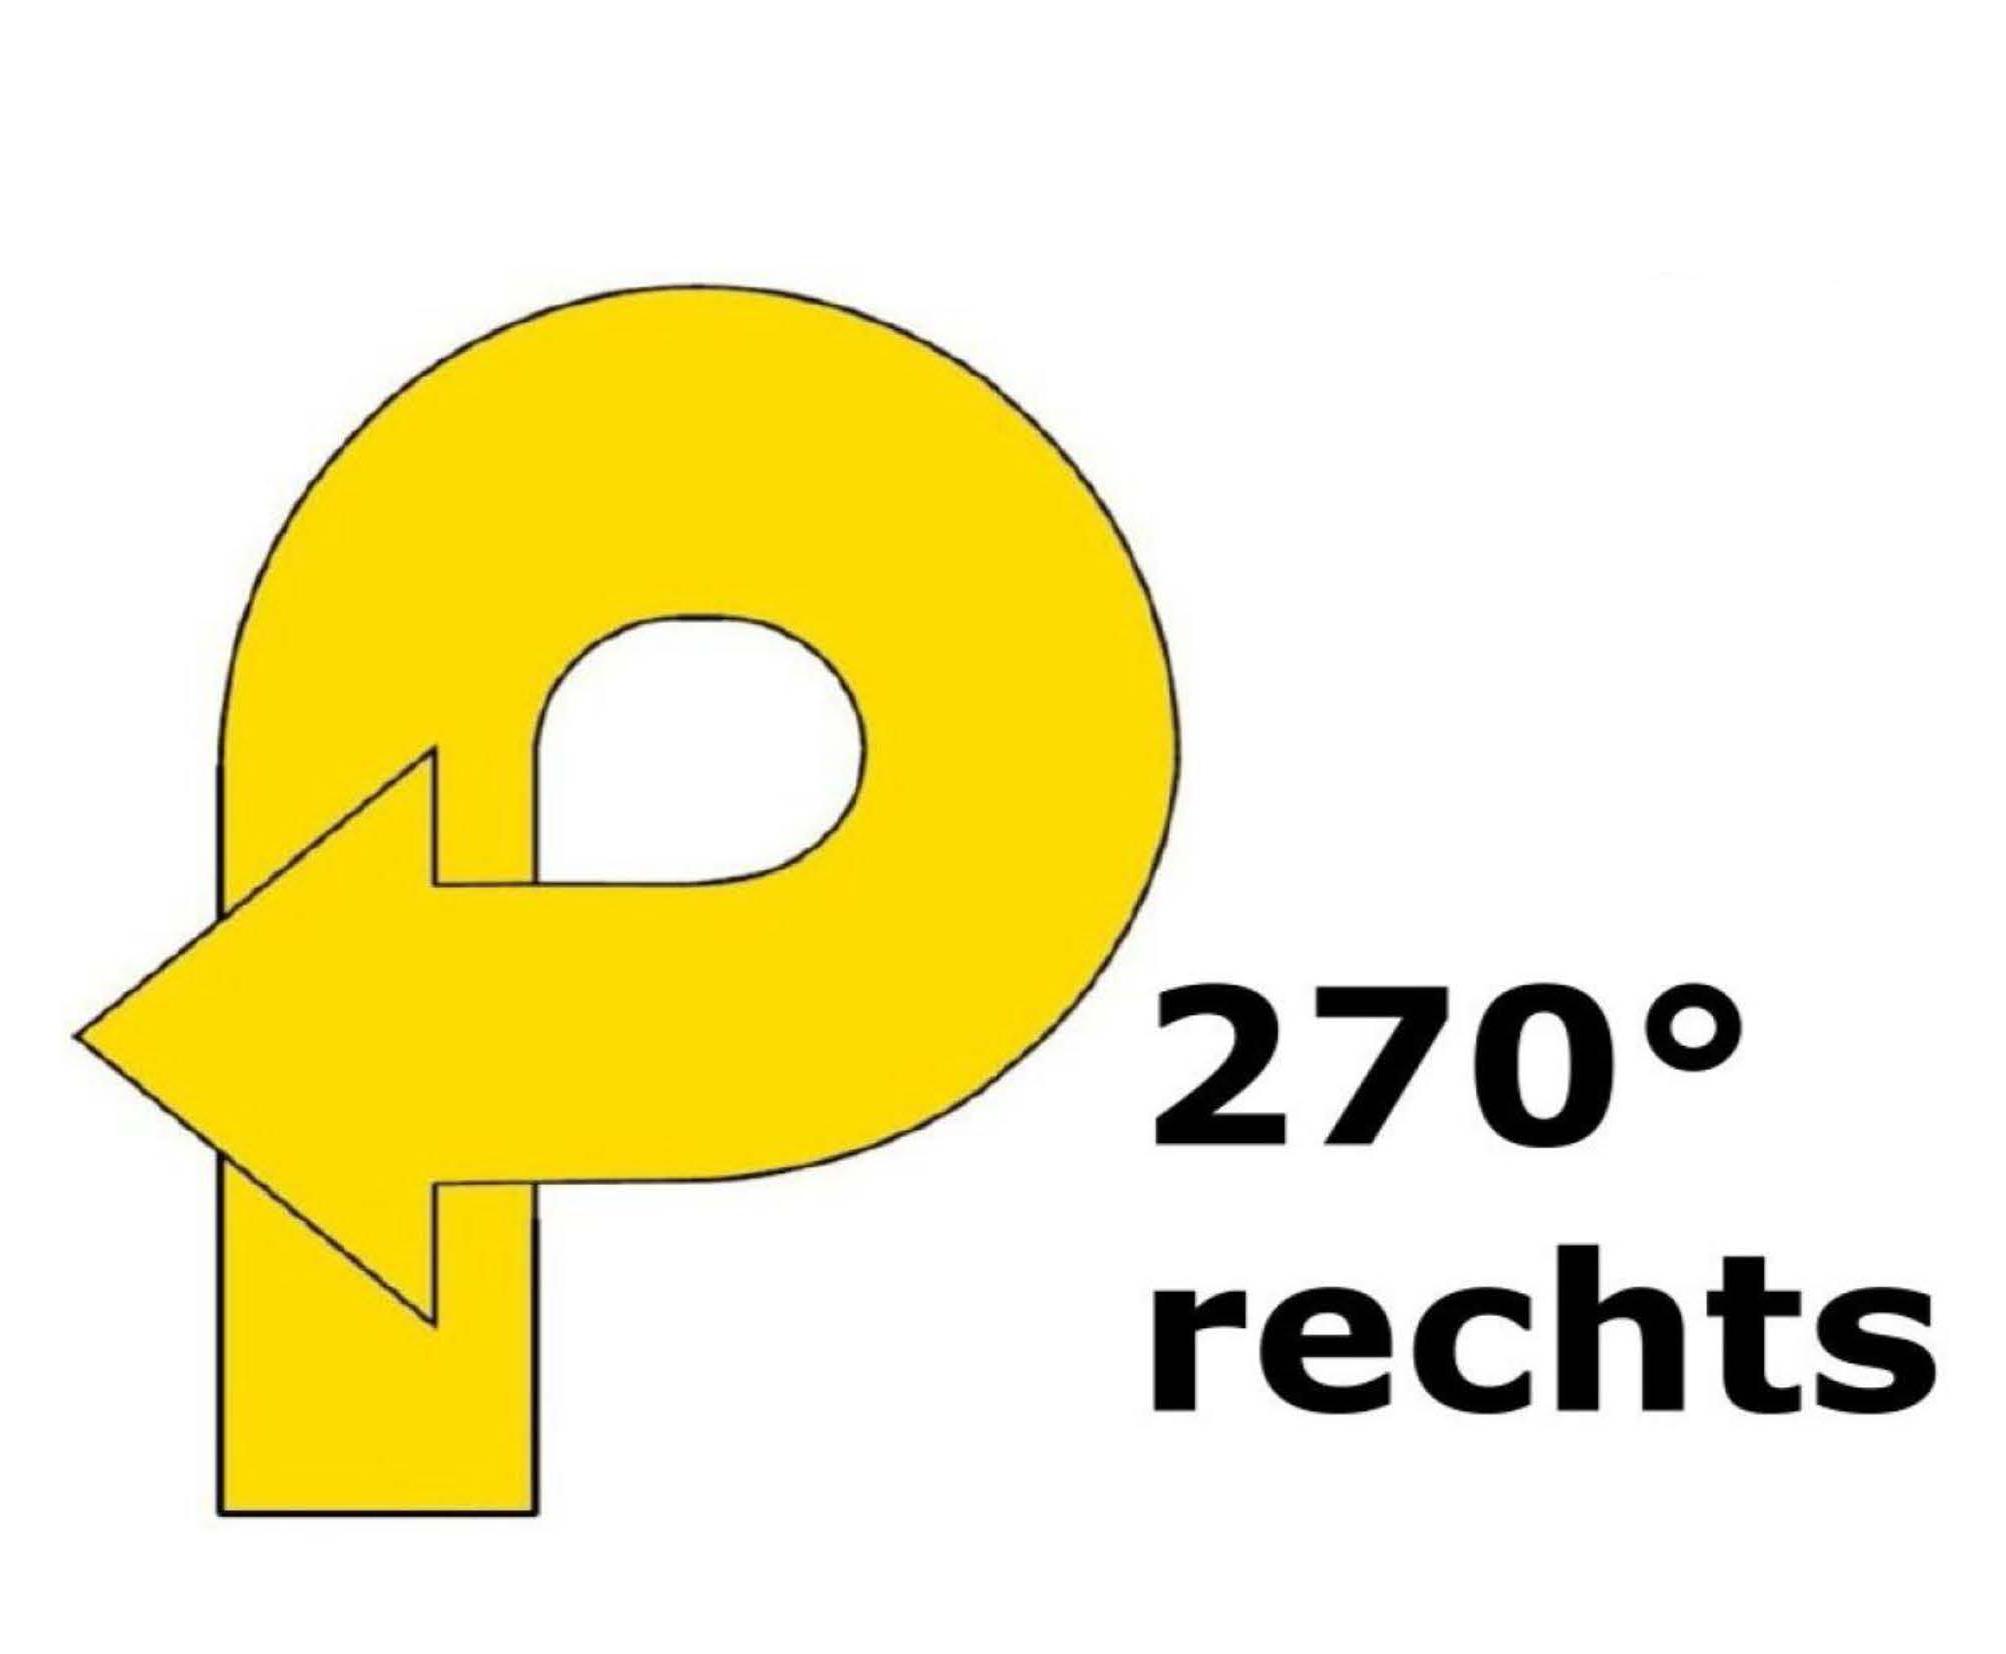 RO_Regelwerk_VDH_3.0_Stand_01-2017 - 011